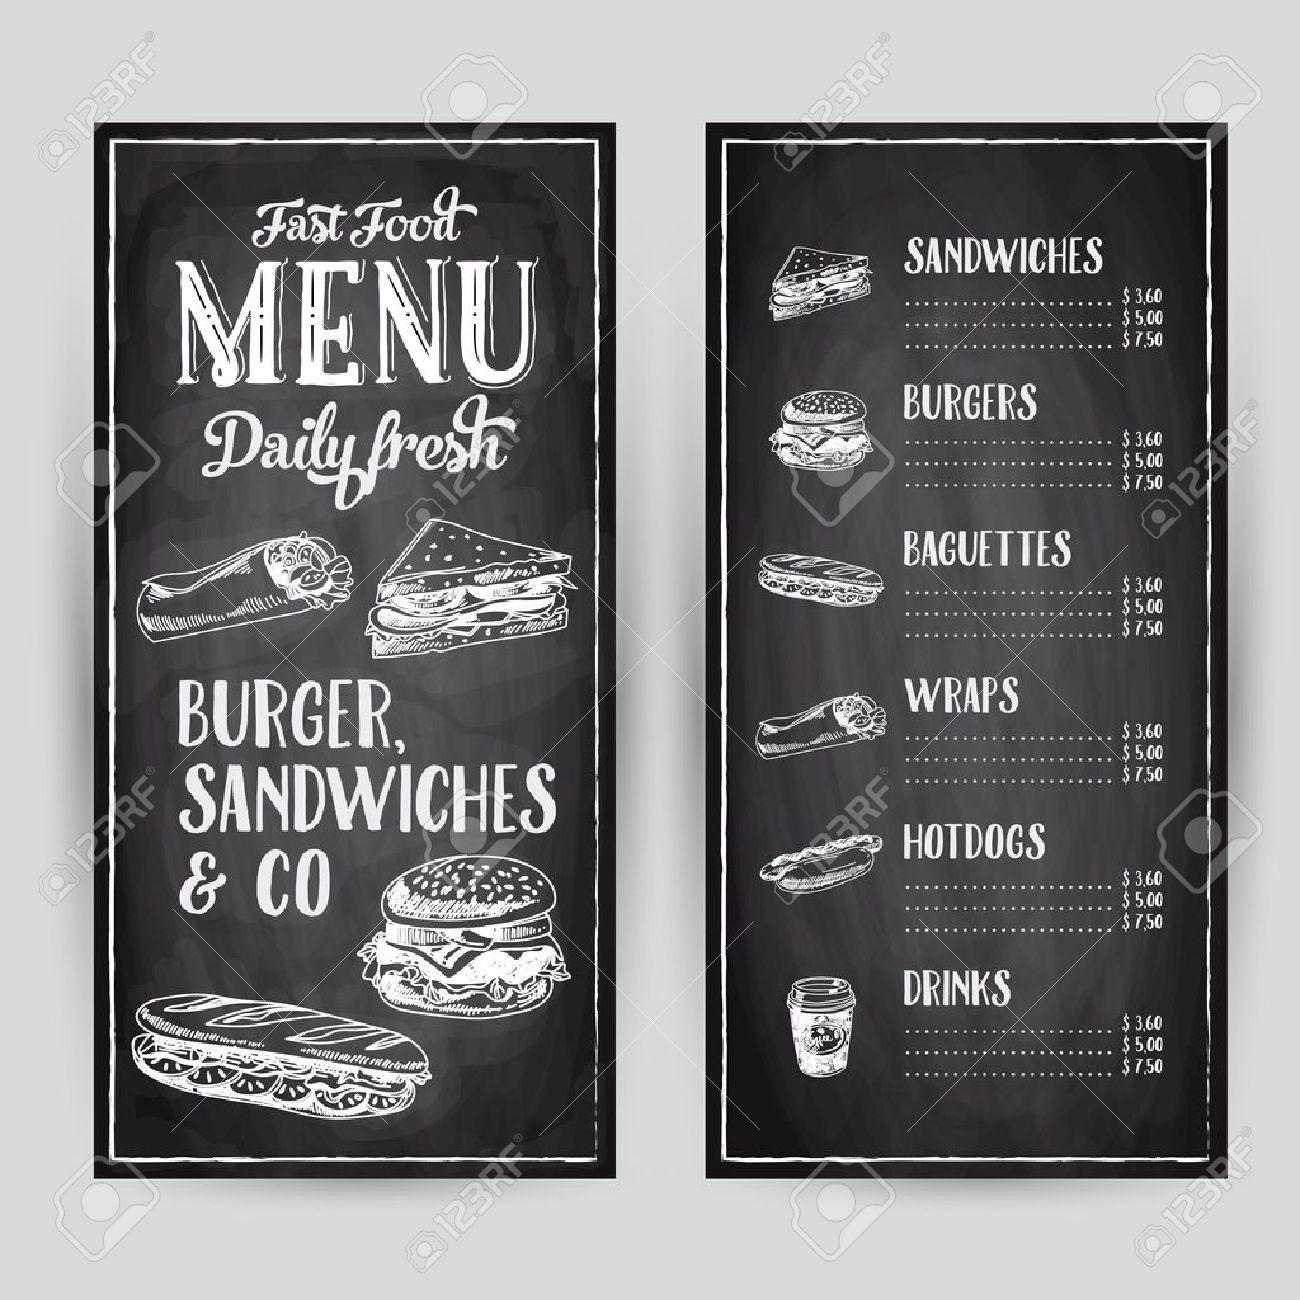 Vector hand drawn illustration with fast food. Restaurant menu. Chalkboard. Sketch. - 49425282